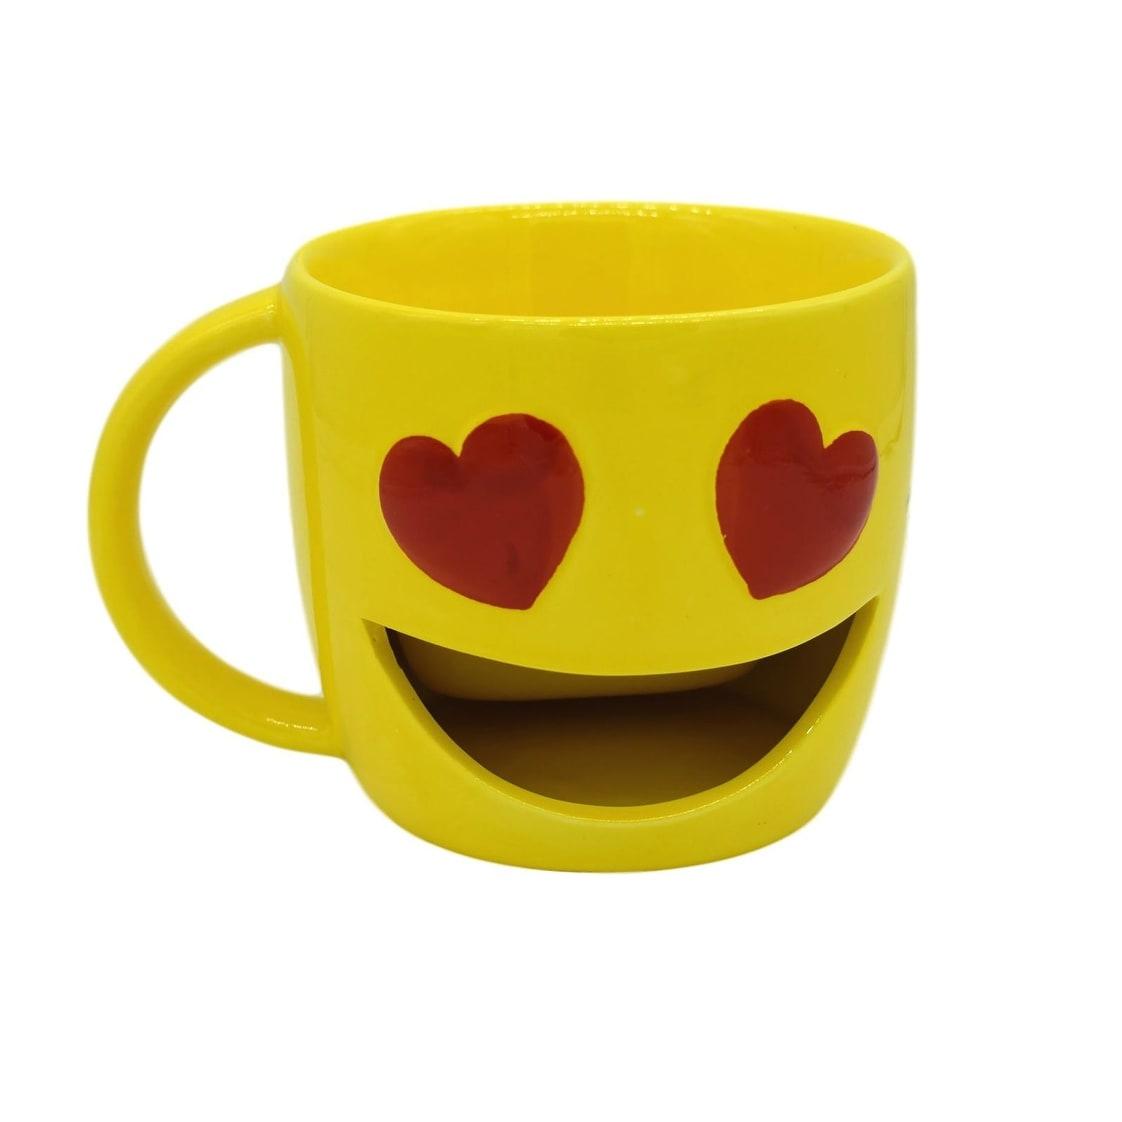 Kaomojizone Heart Eyes Emoji Mug Overstock 31312935